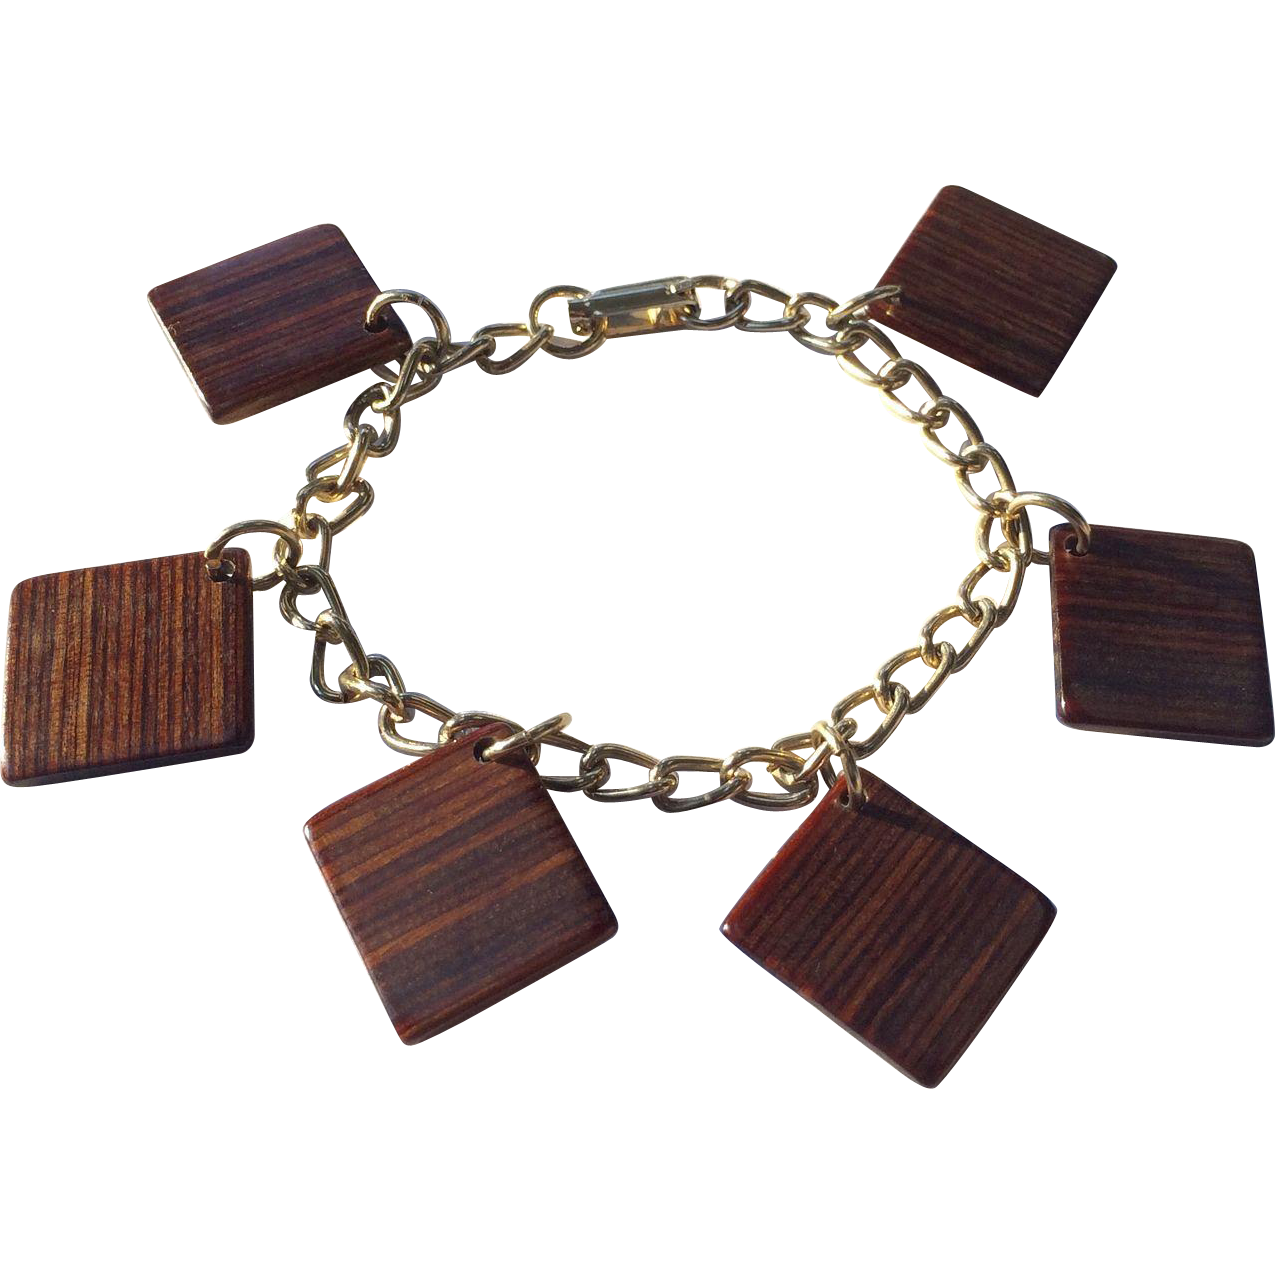 Square Charm Bracelet: Square Wood Mid Century Geometric Charm Bracelet From